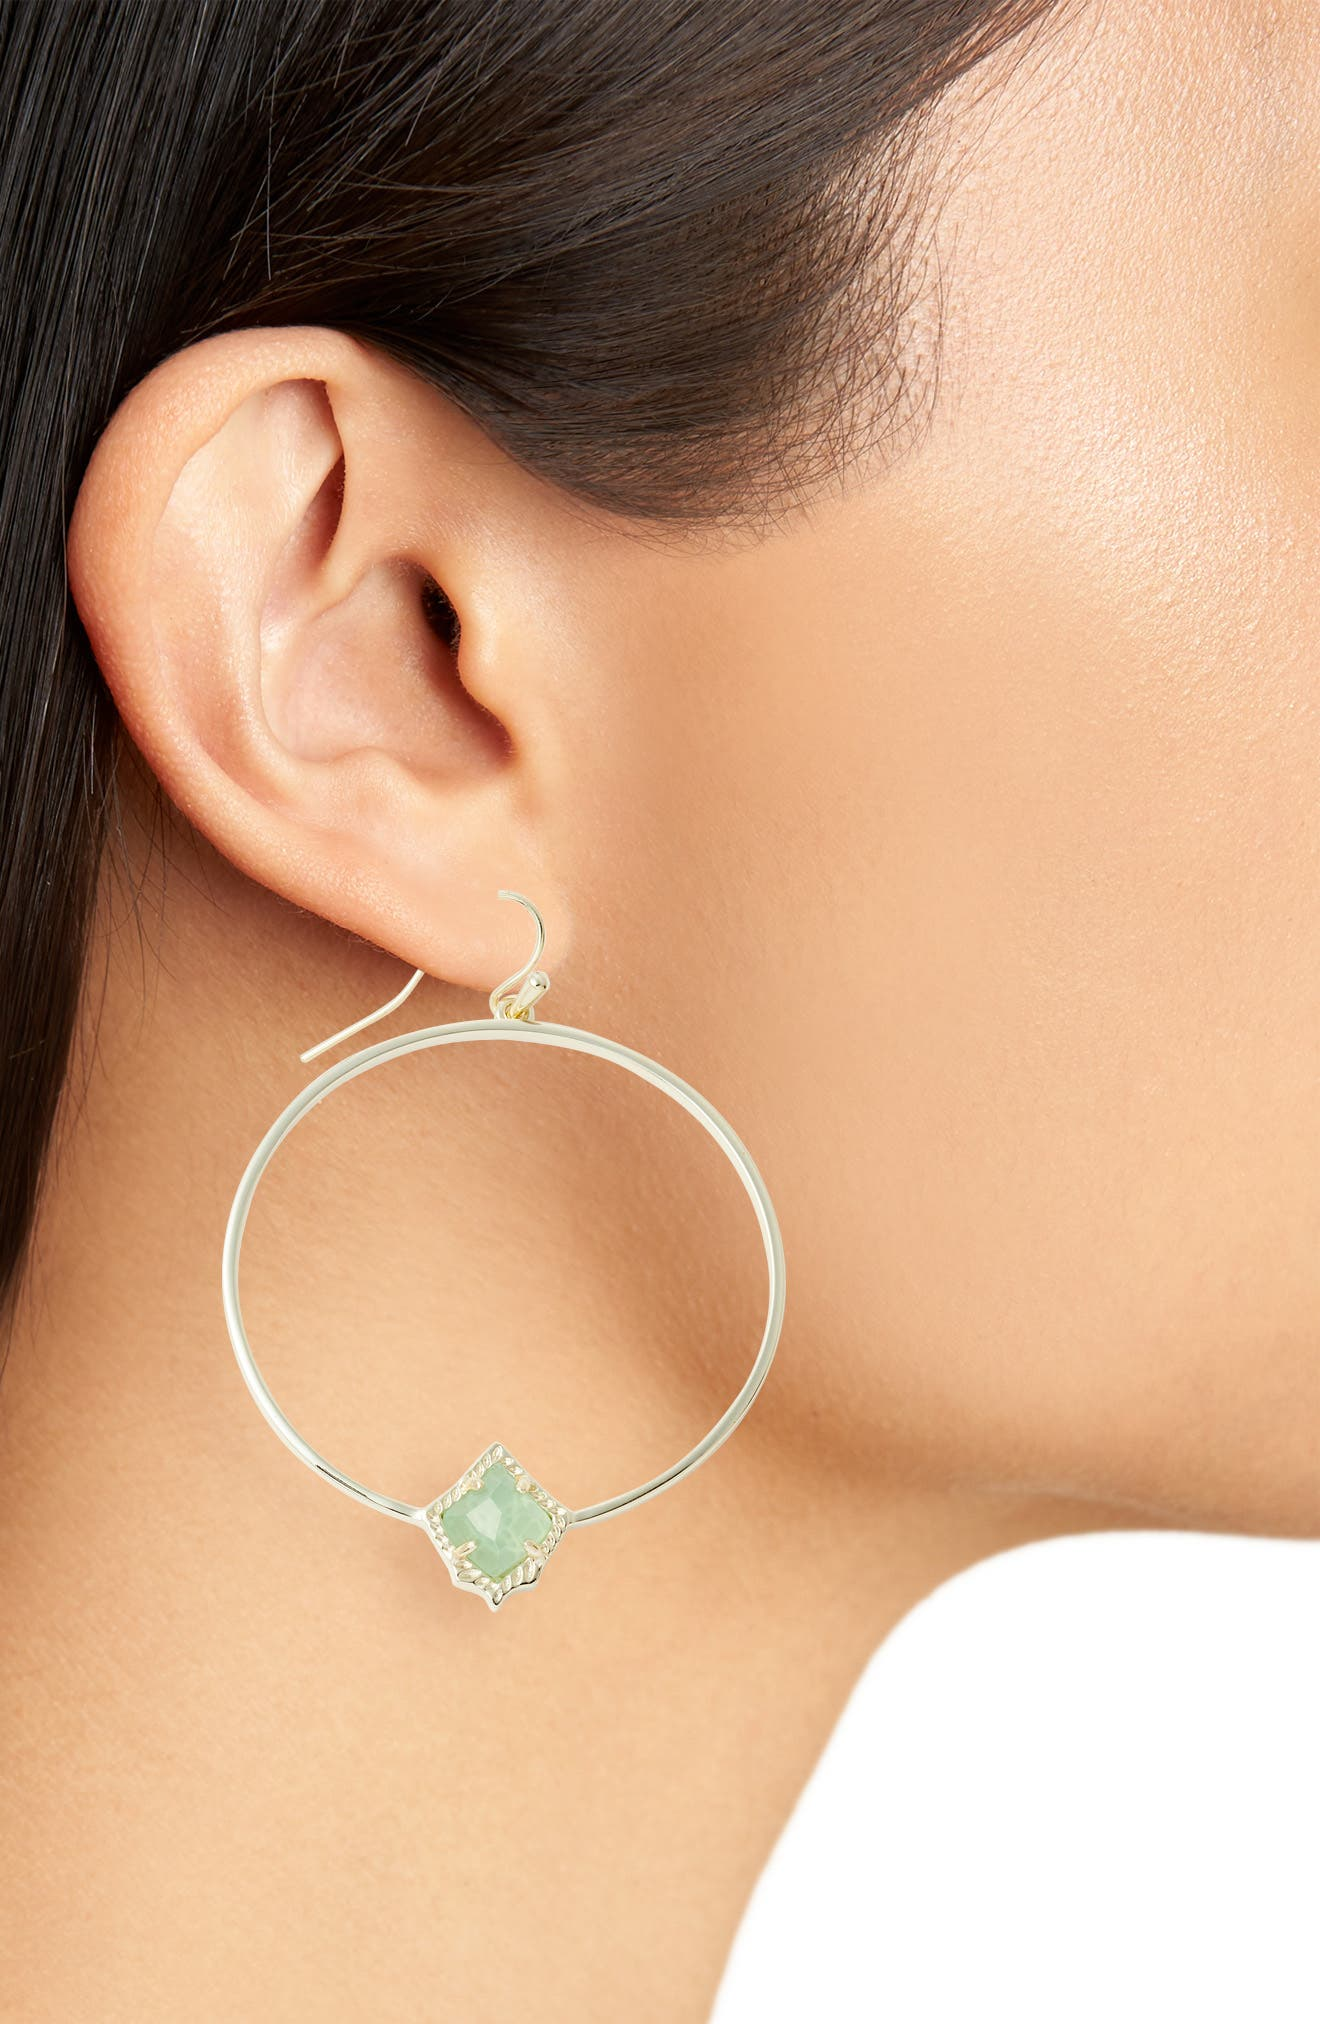 Elberta Hoop Earrings,                             Alternate thumbnail 2, color,                             Chalcedony/ Gold